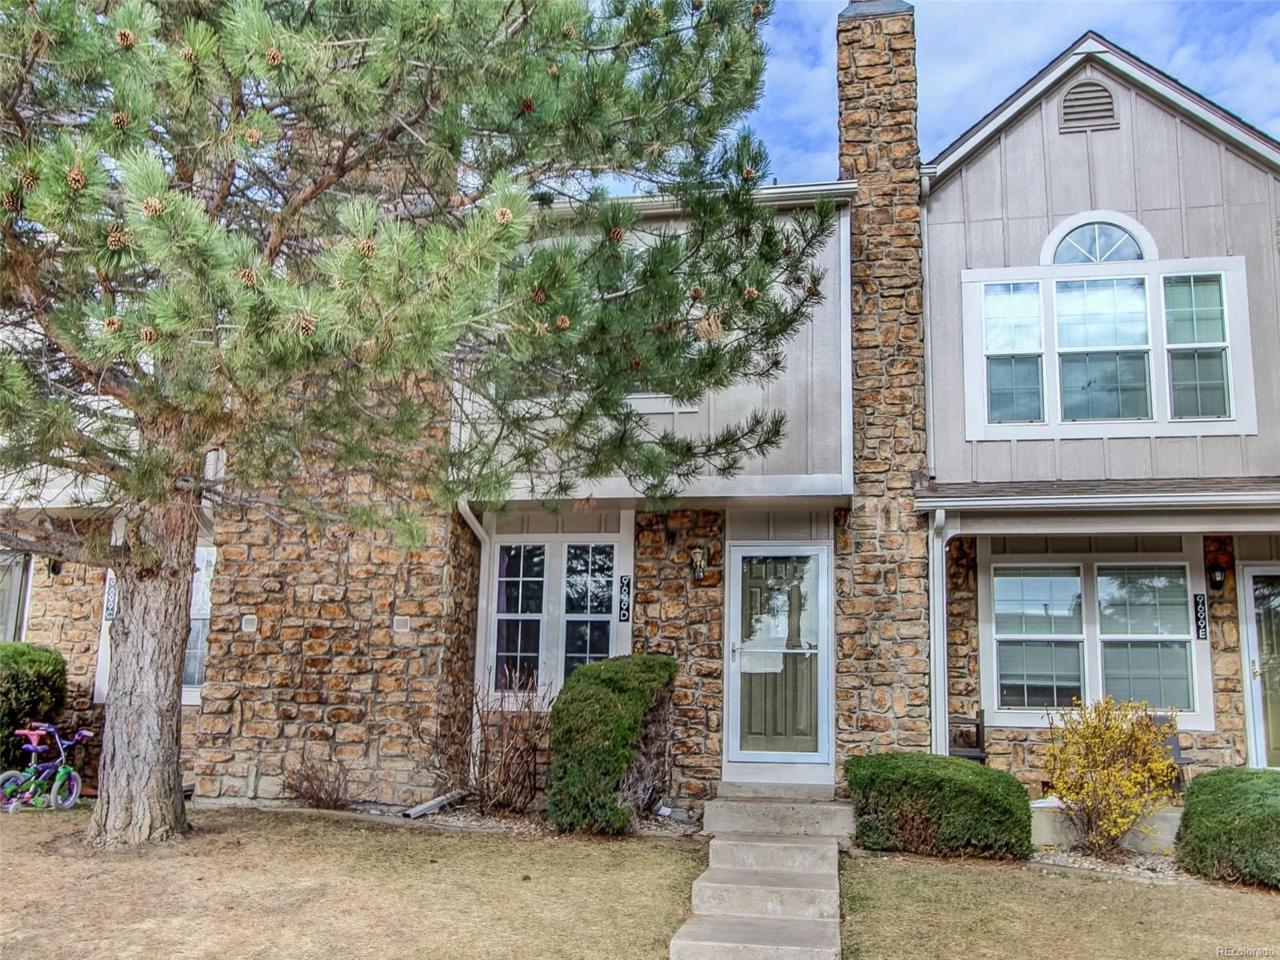 9699 W Chatfield Avenue D, Littleton, CO 80128 (MLS #7866664) :: 8z Real Estate